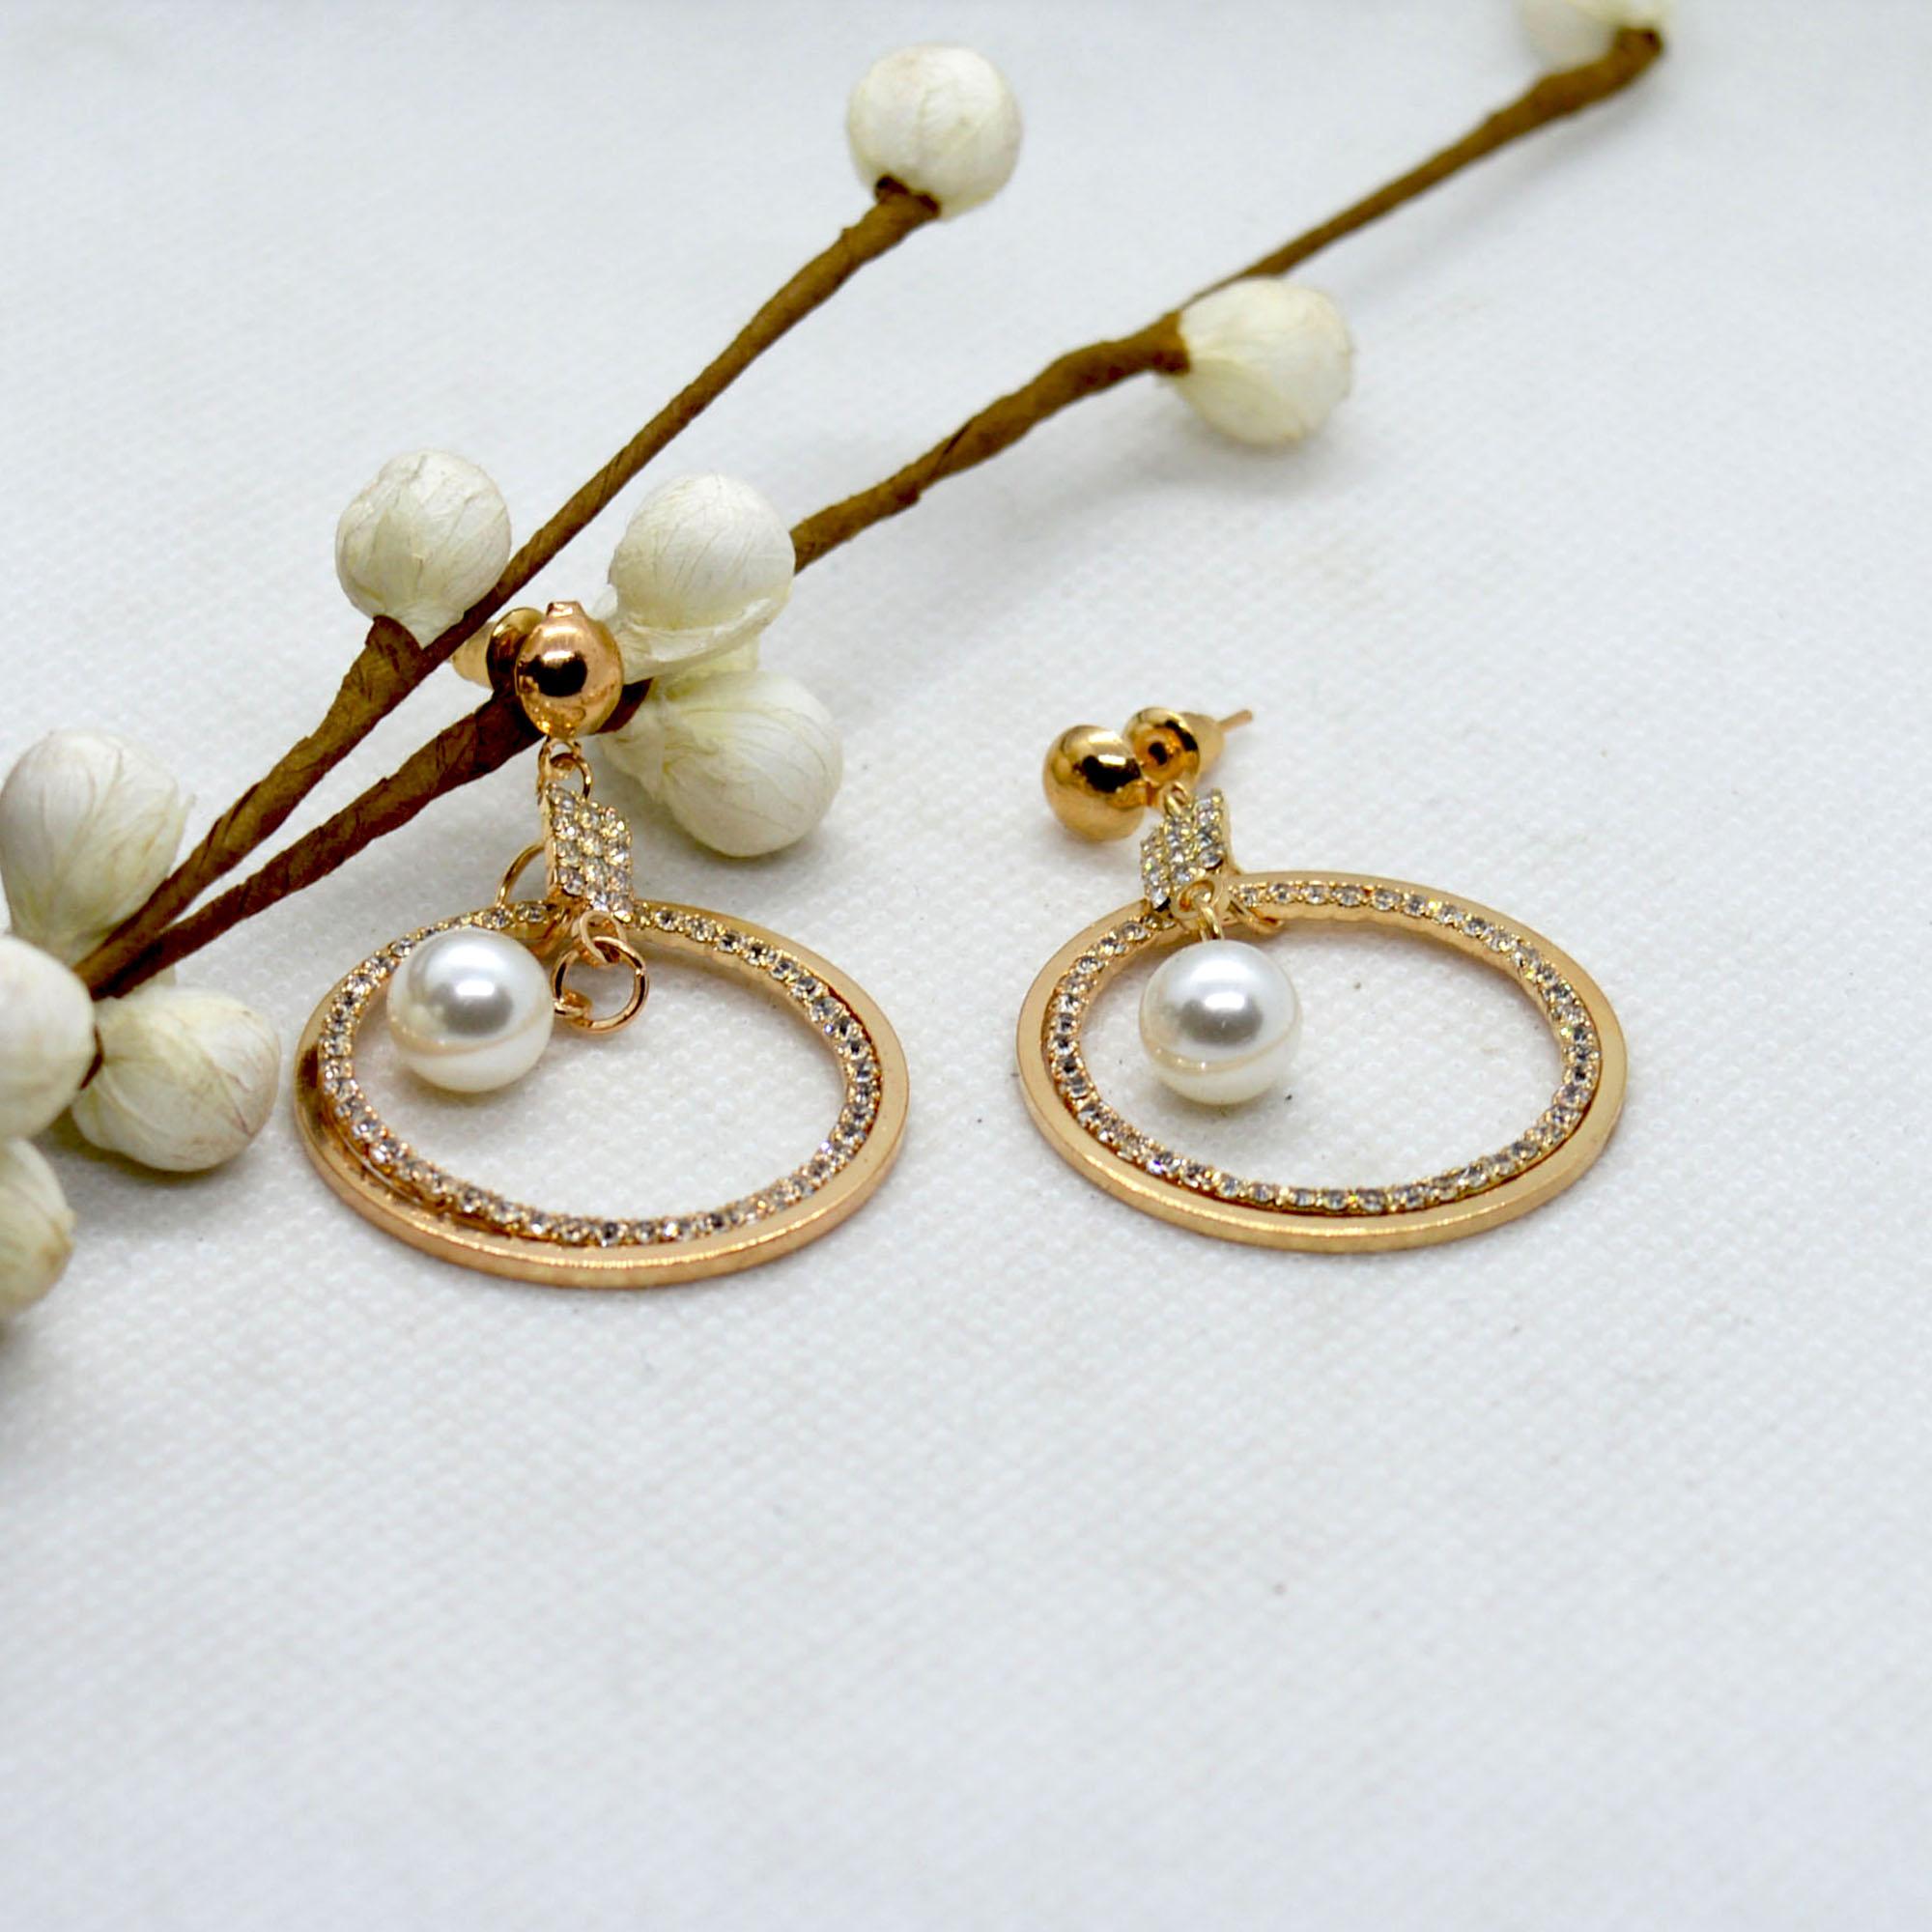 Golden Round Stoned Earrings F...